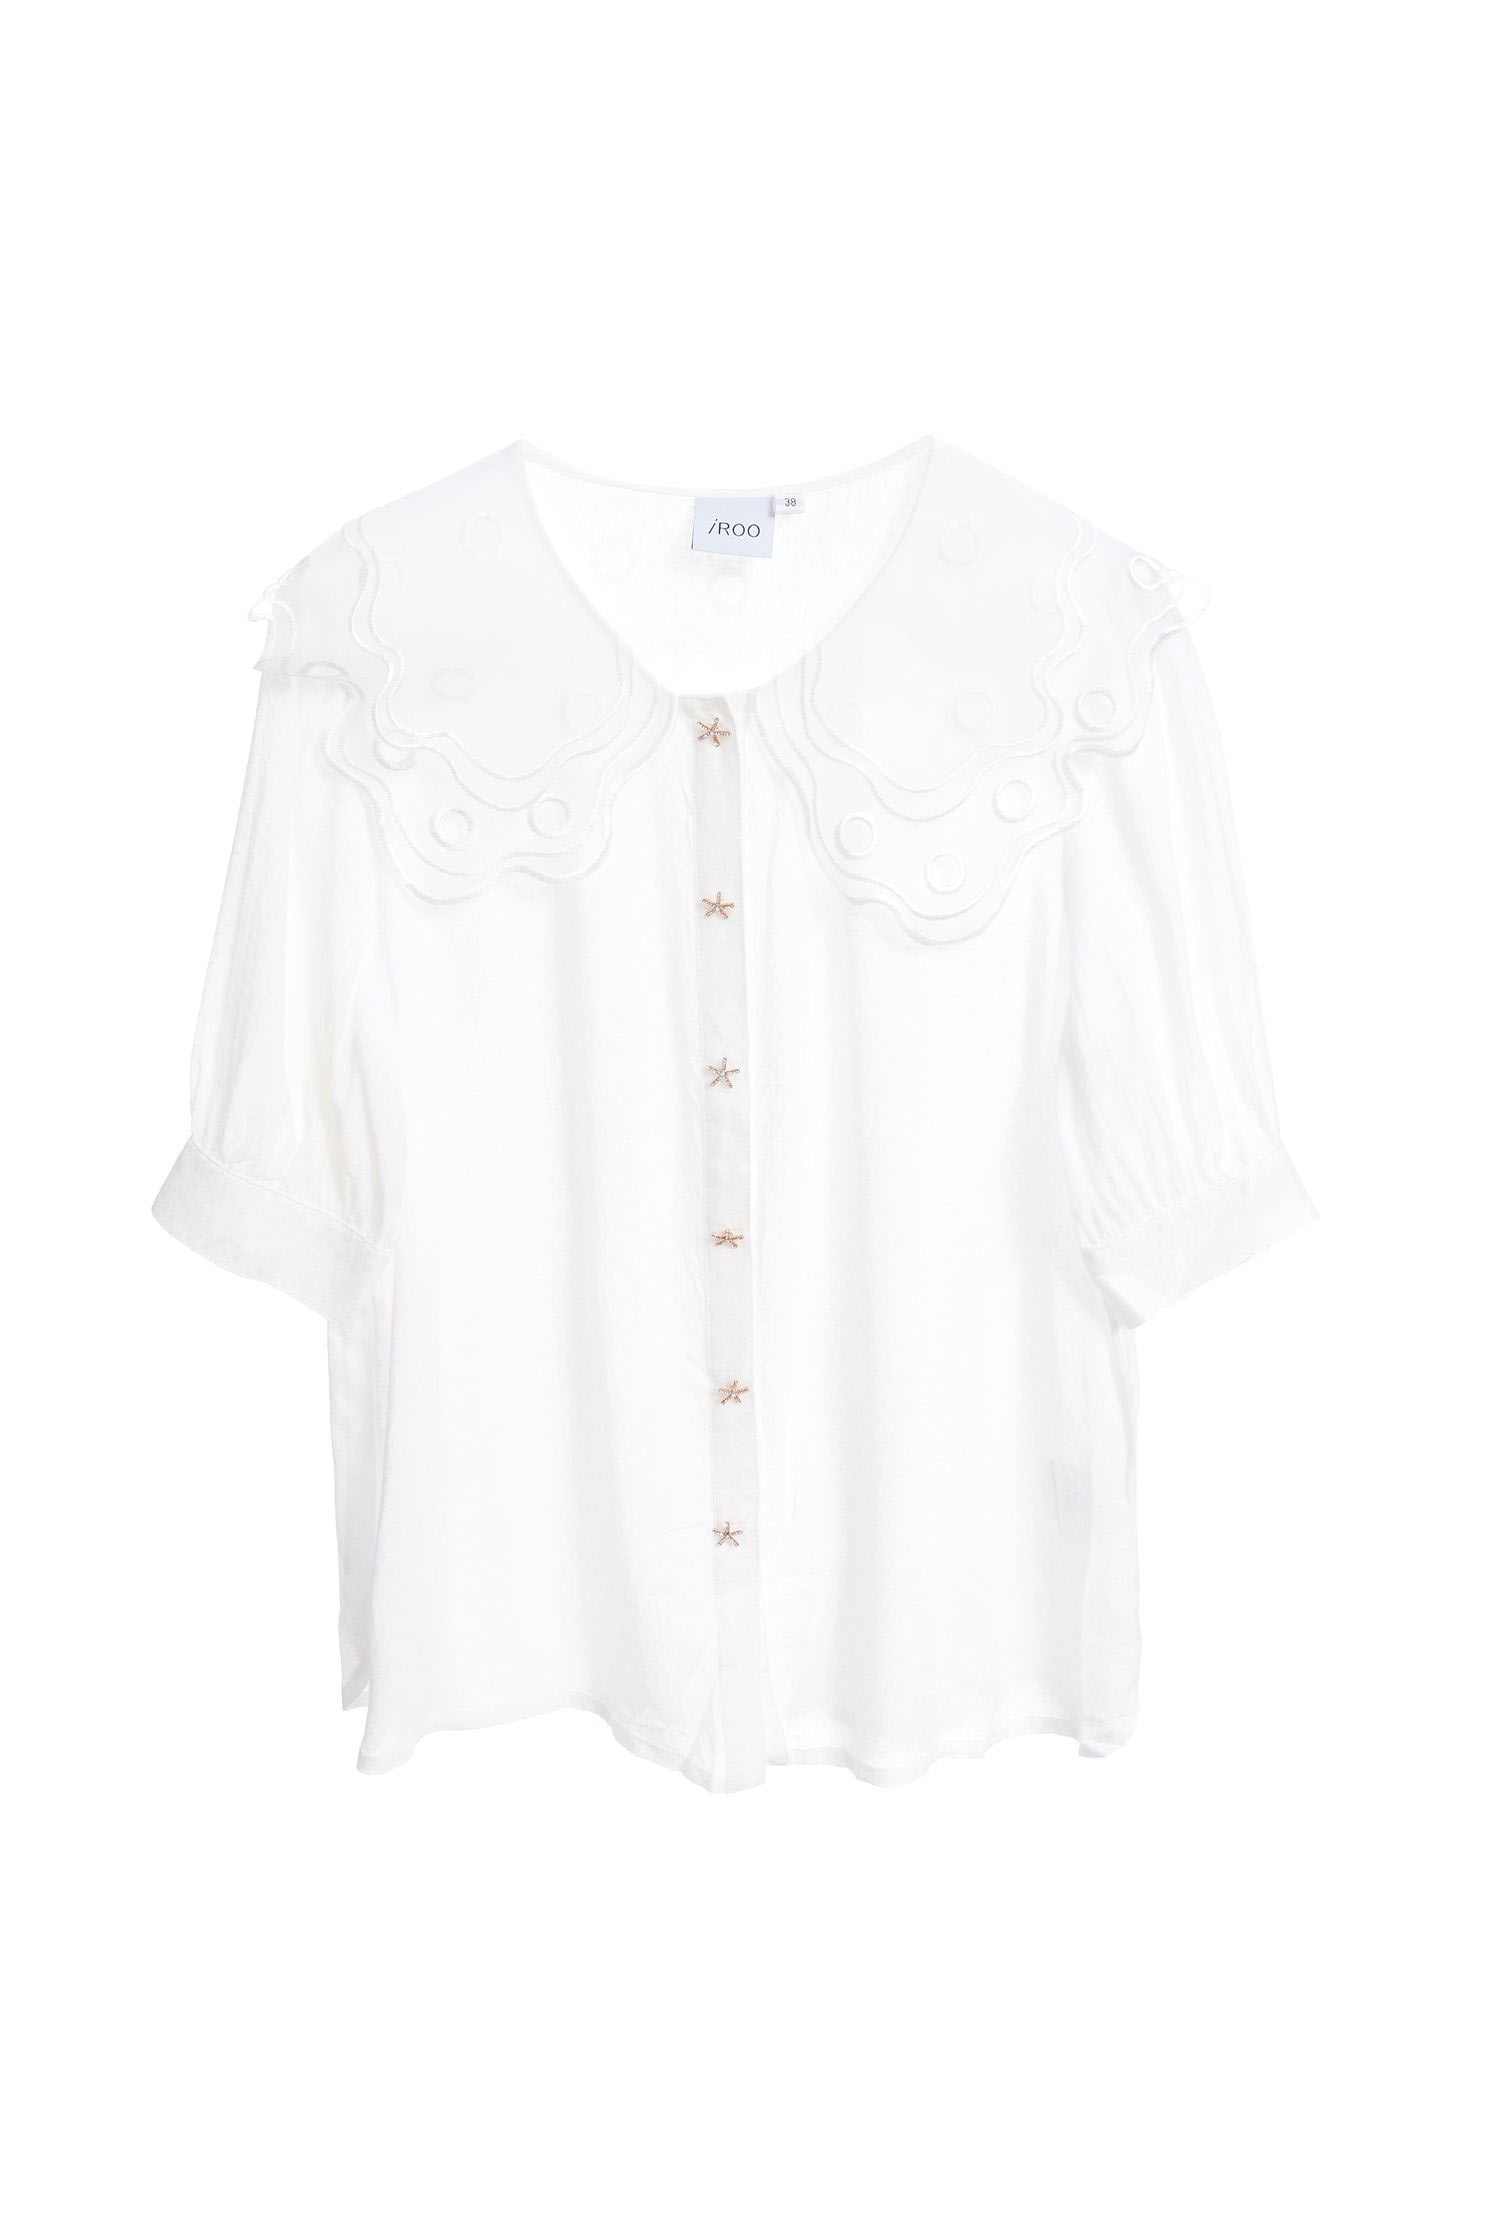 Transparency designed shirts,top,whitetop,shortsleevetop,i-select,blouse,longsleevetop